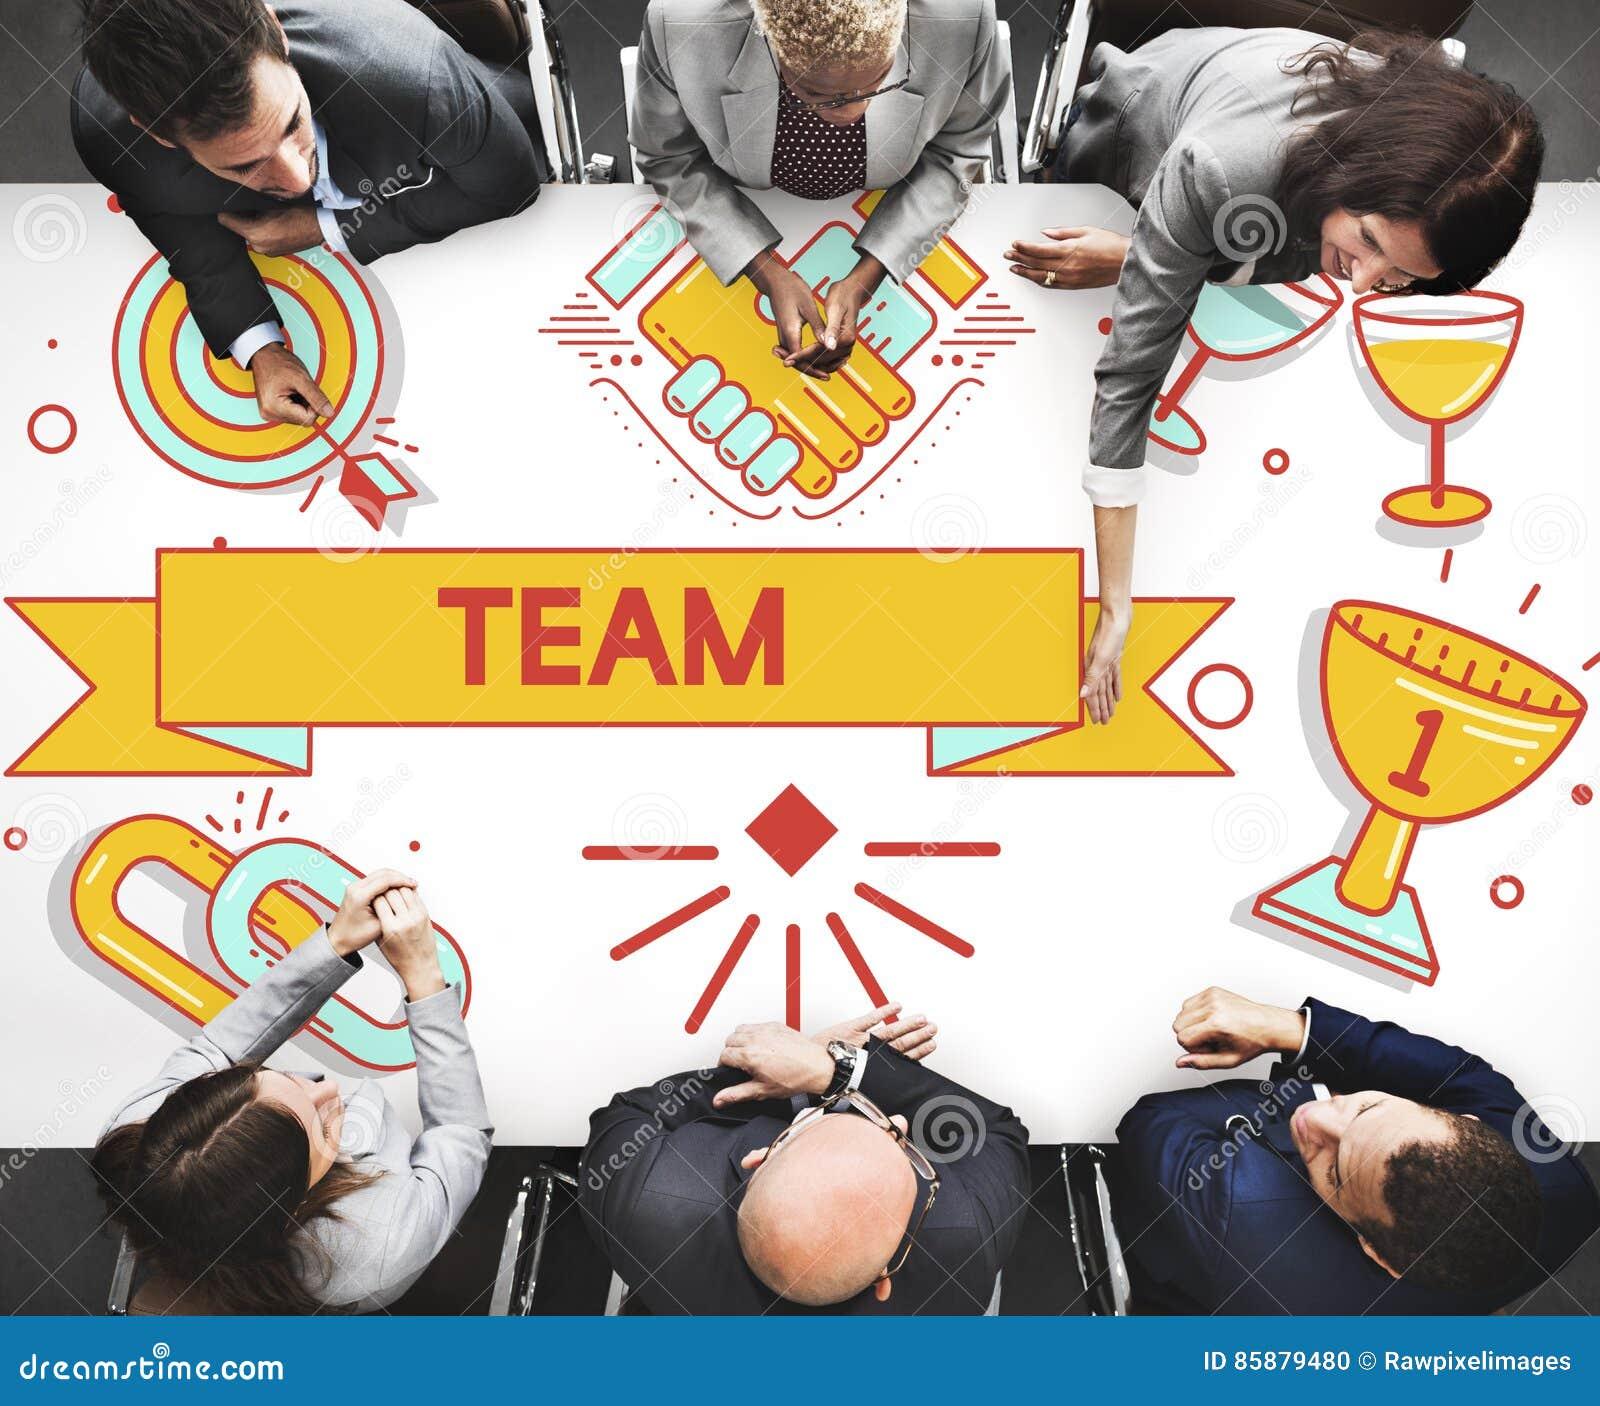 Team Teamwork Partnership Collaboration Concpet